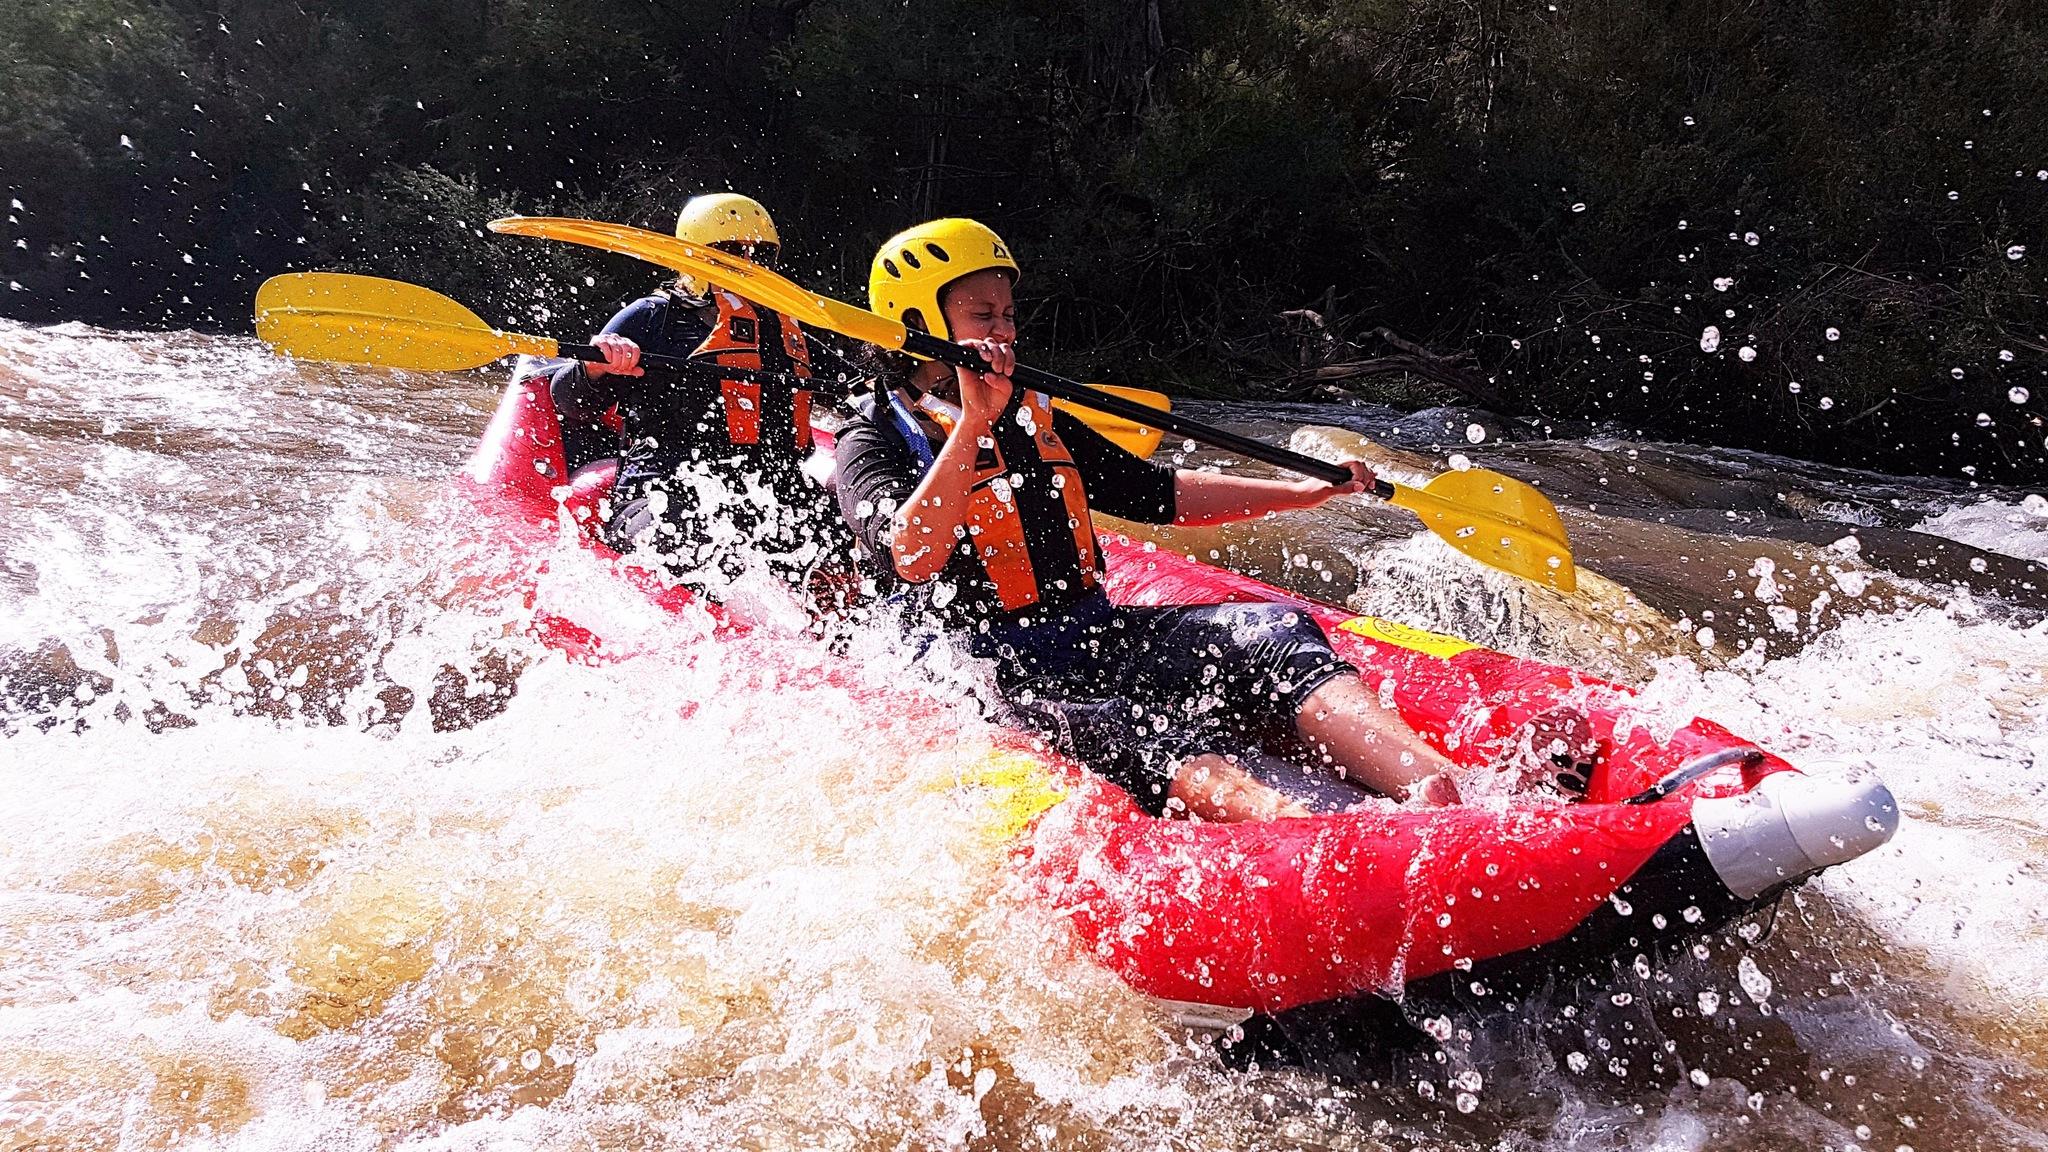 Sports rafting